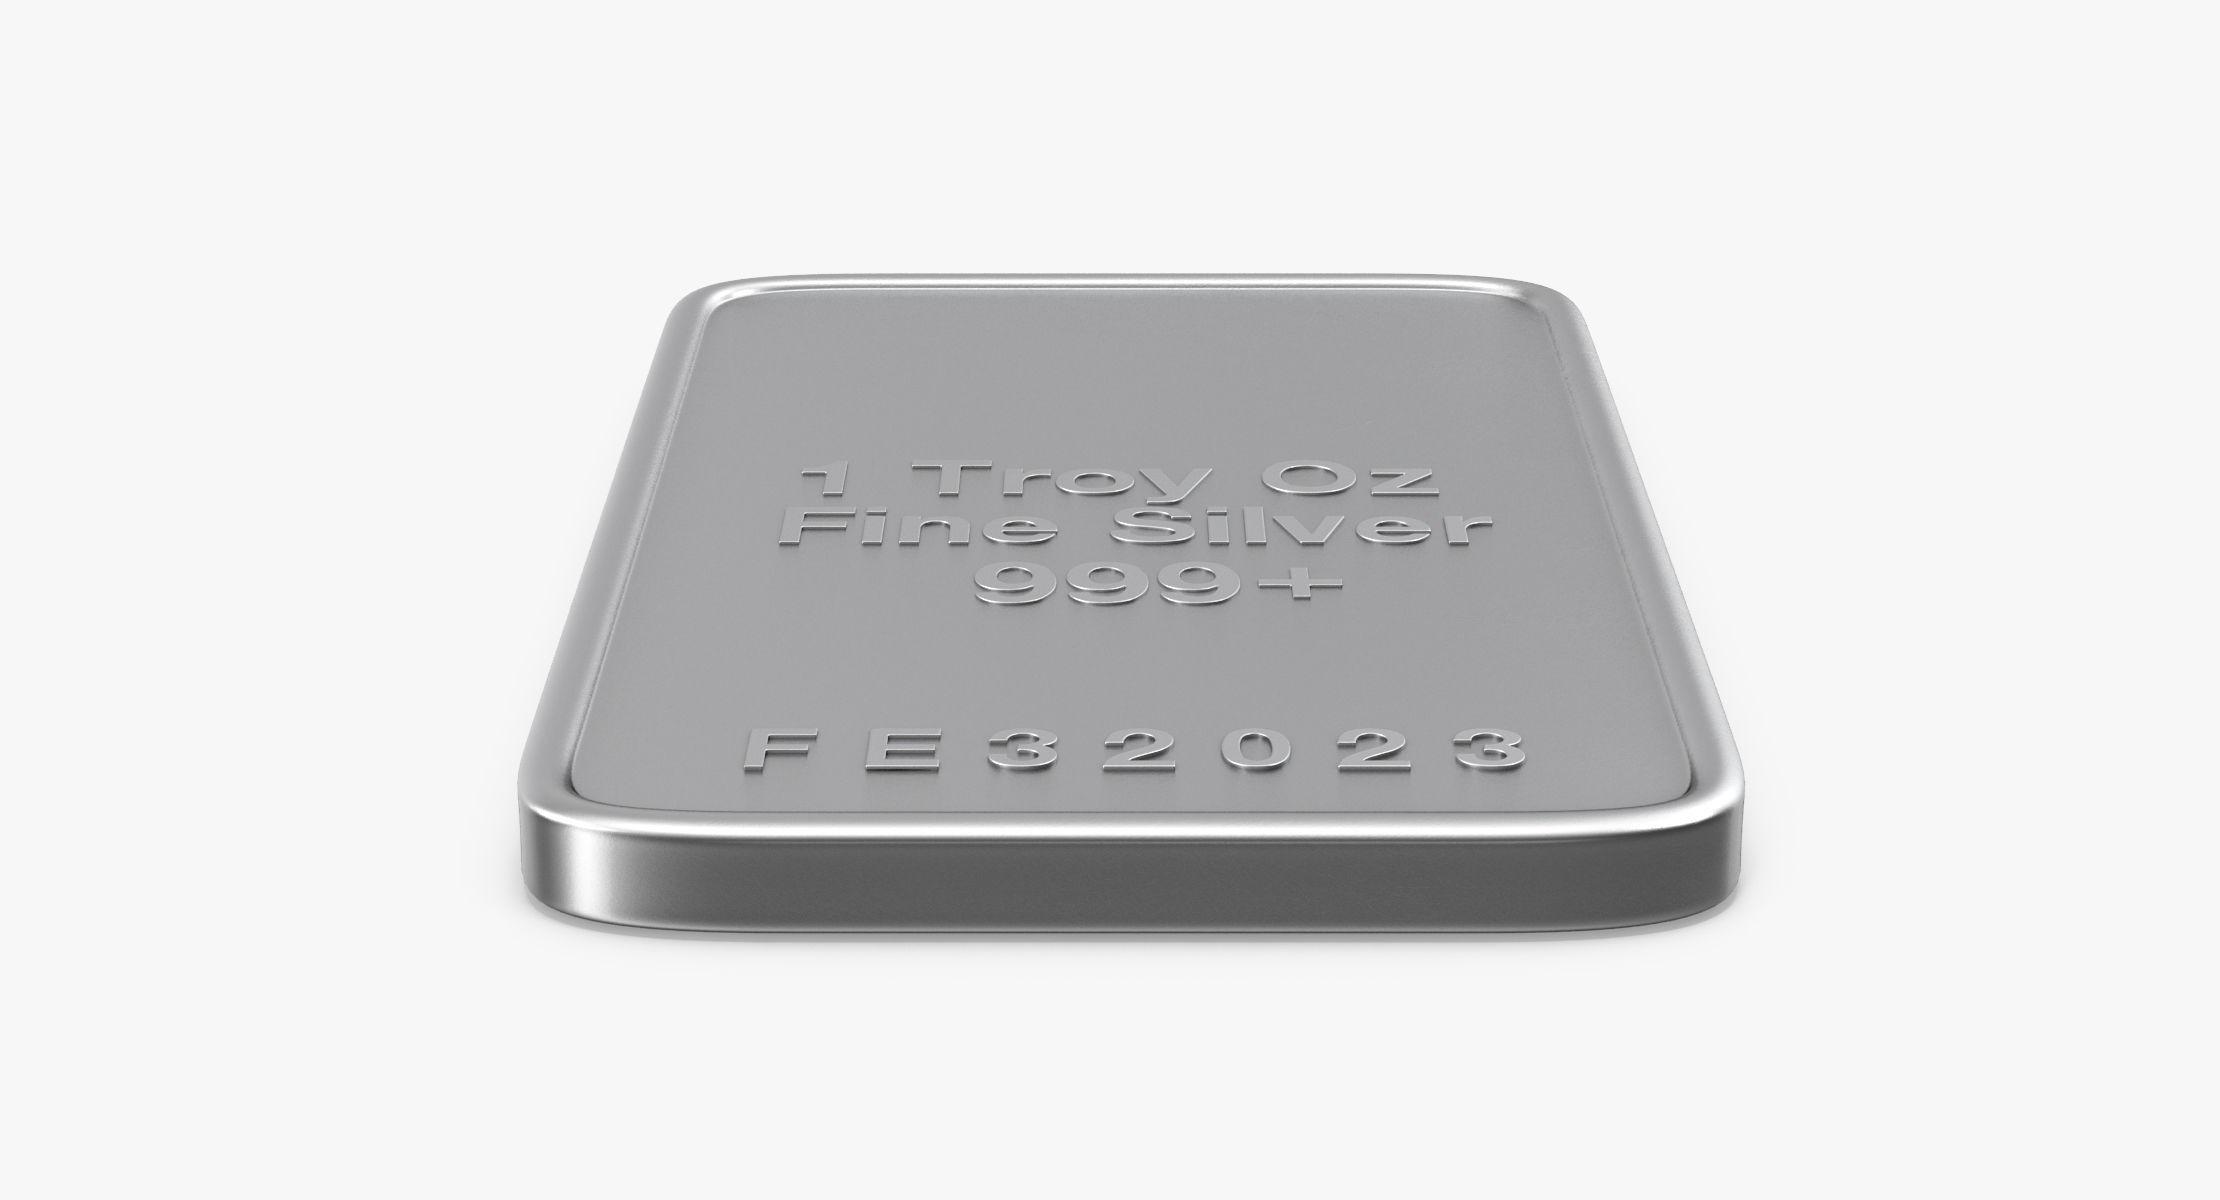 Silver Ounce - reel 1